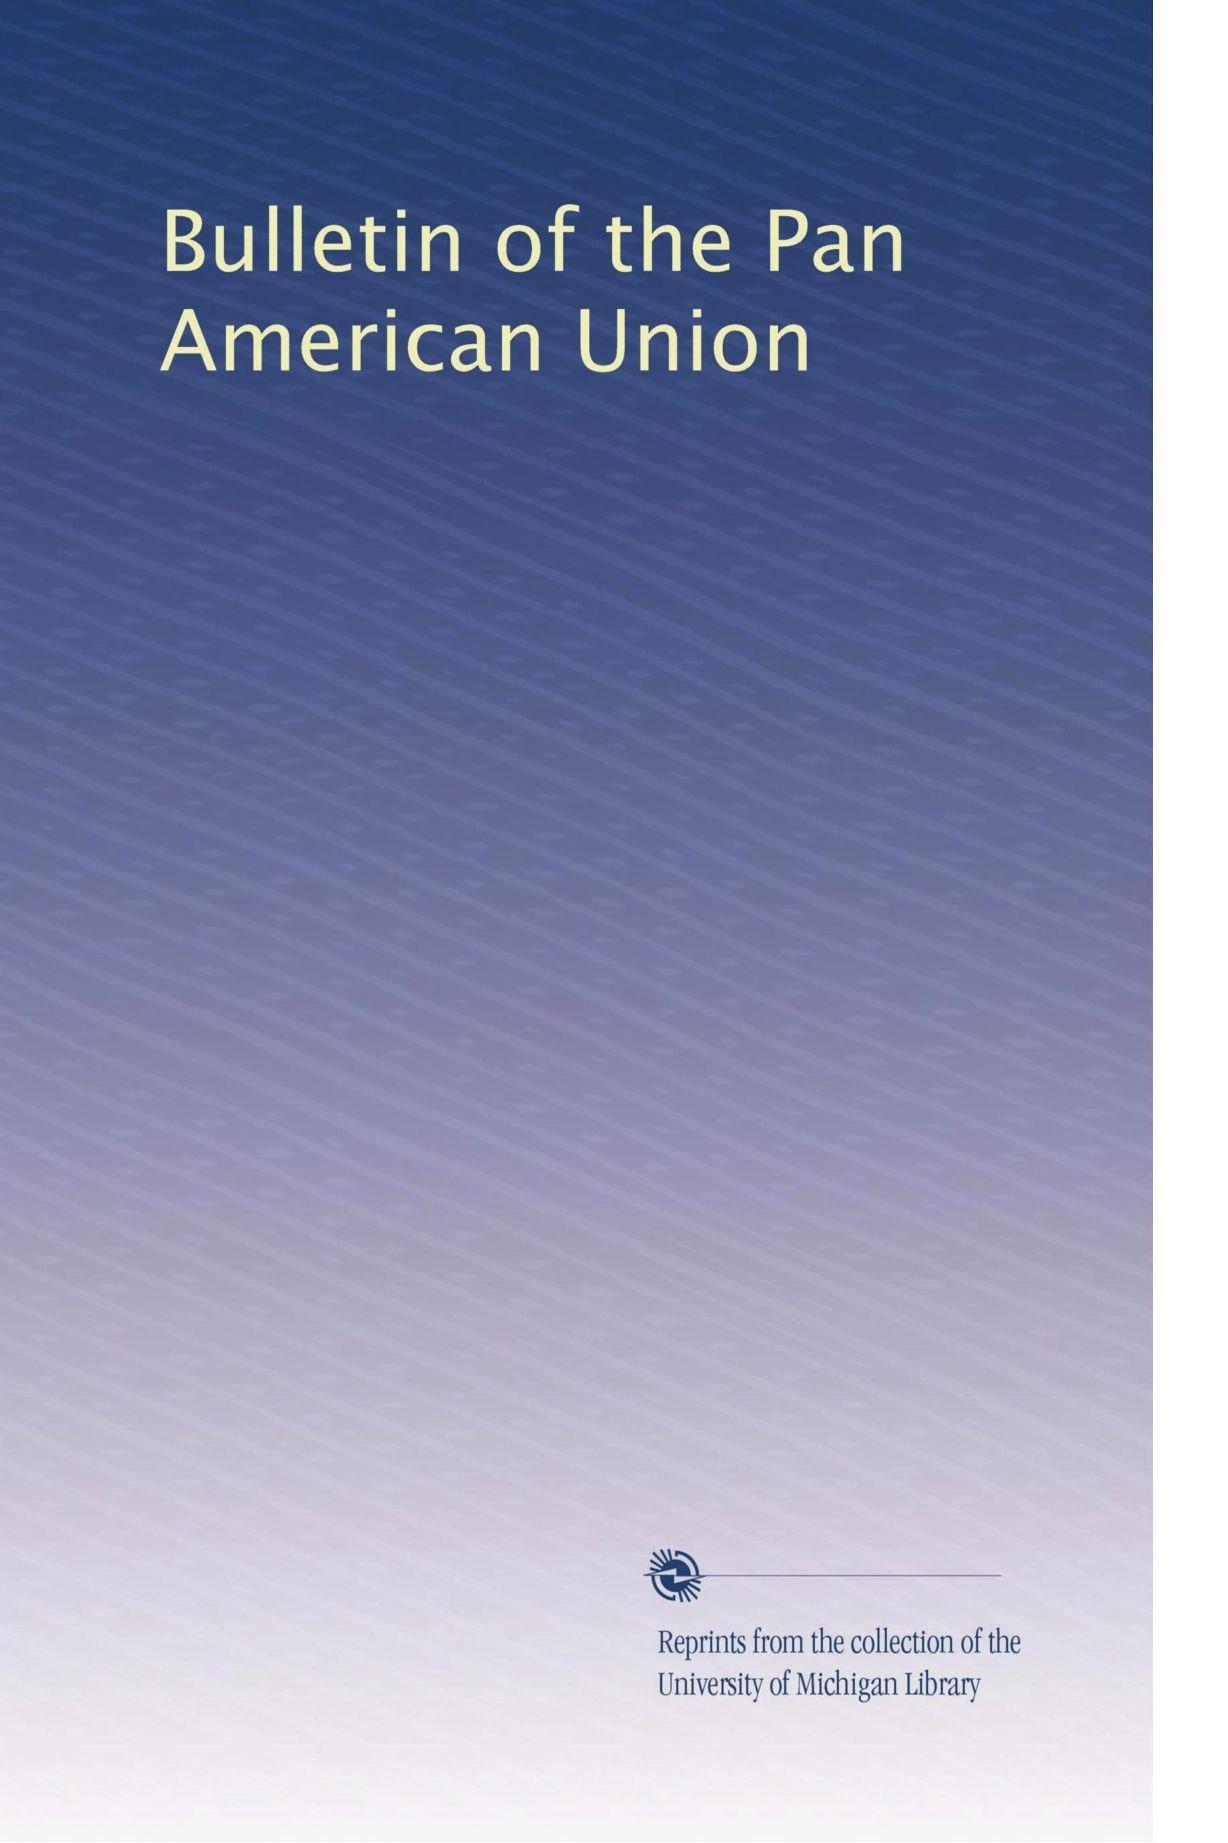 Download Bulletin of the Pan American Union (Volume 9) ebook